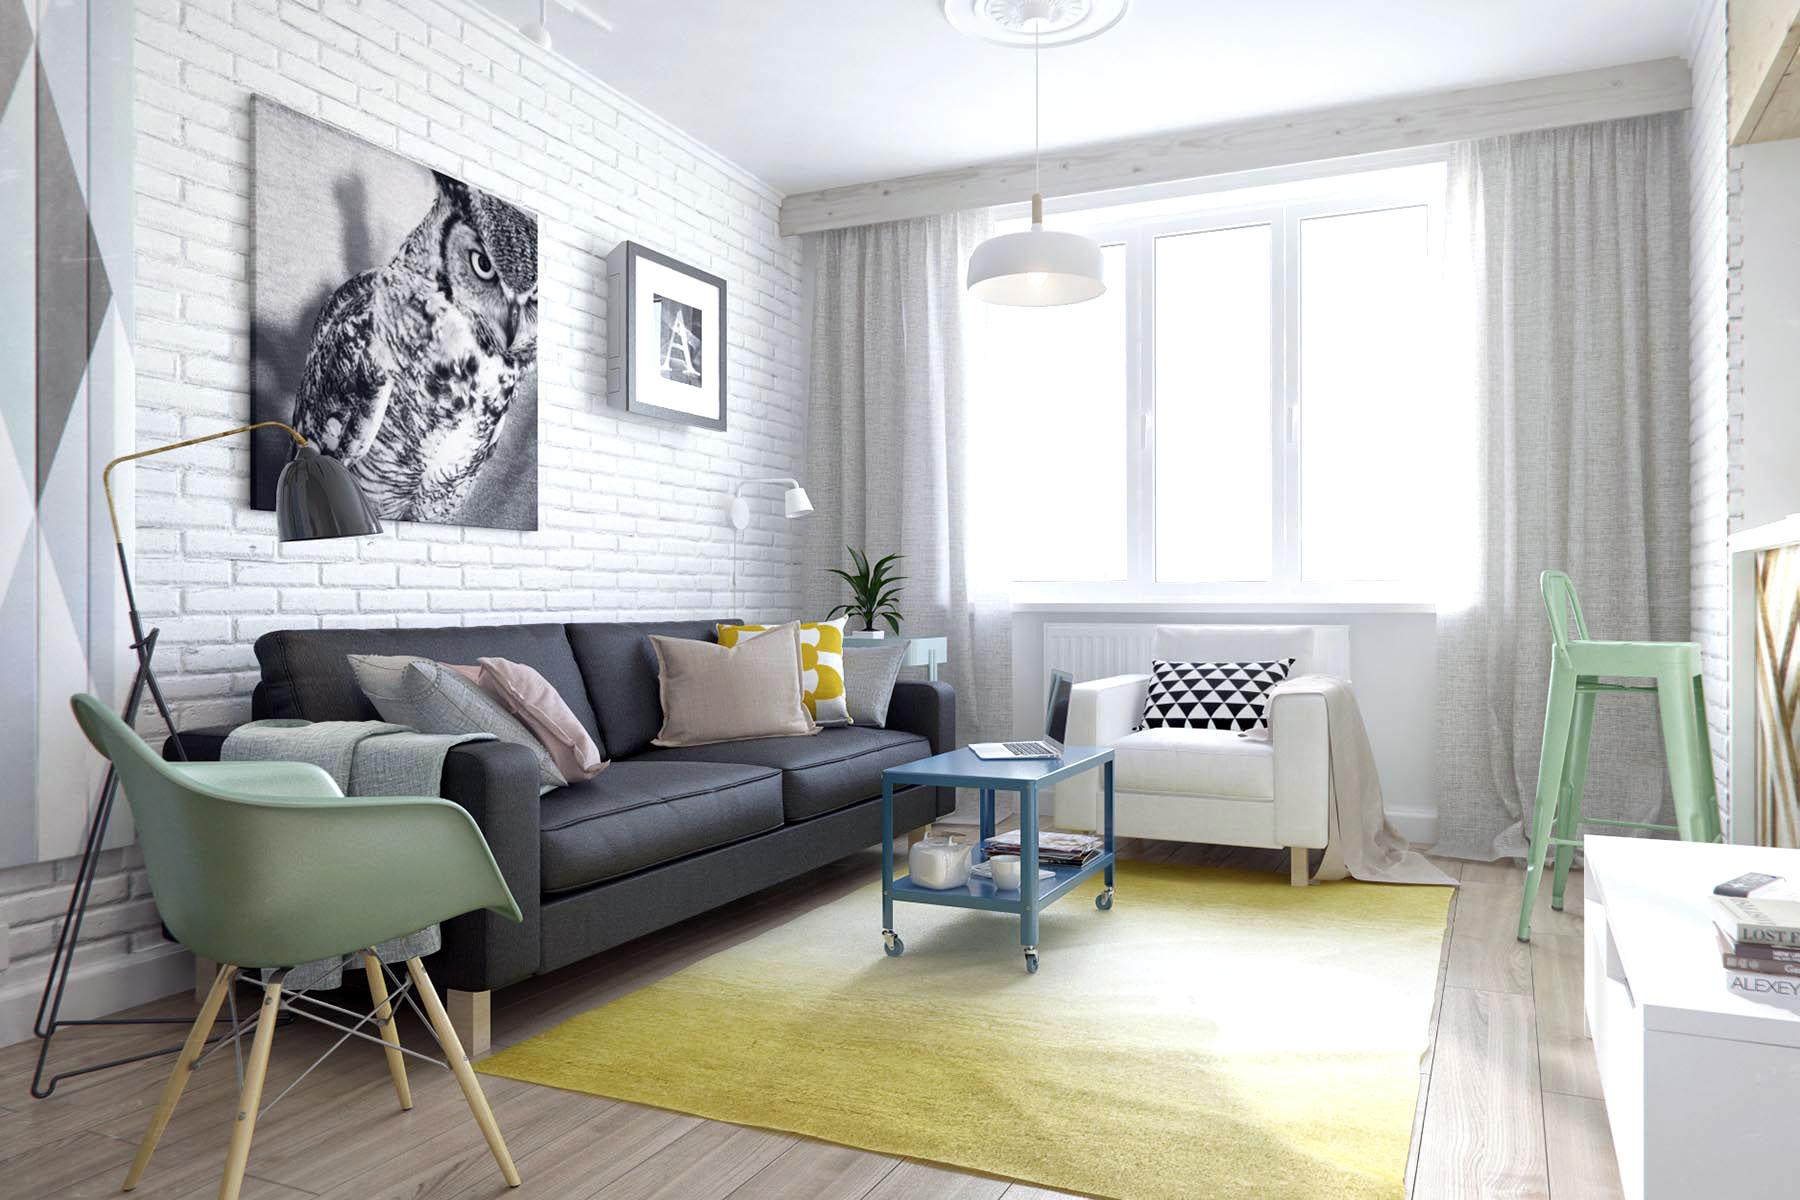 Small russian studio apartment 500 square feet in pastel for Small studio living